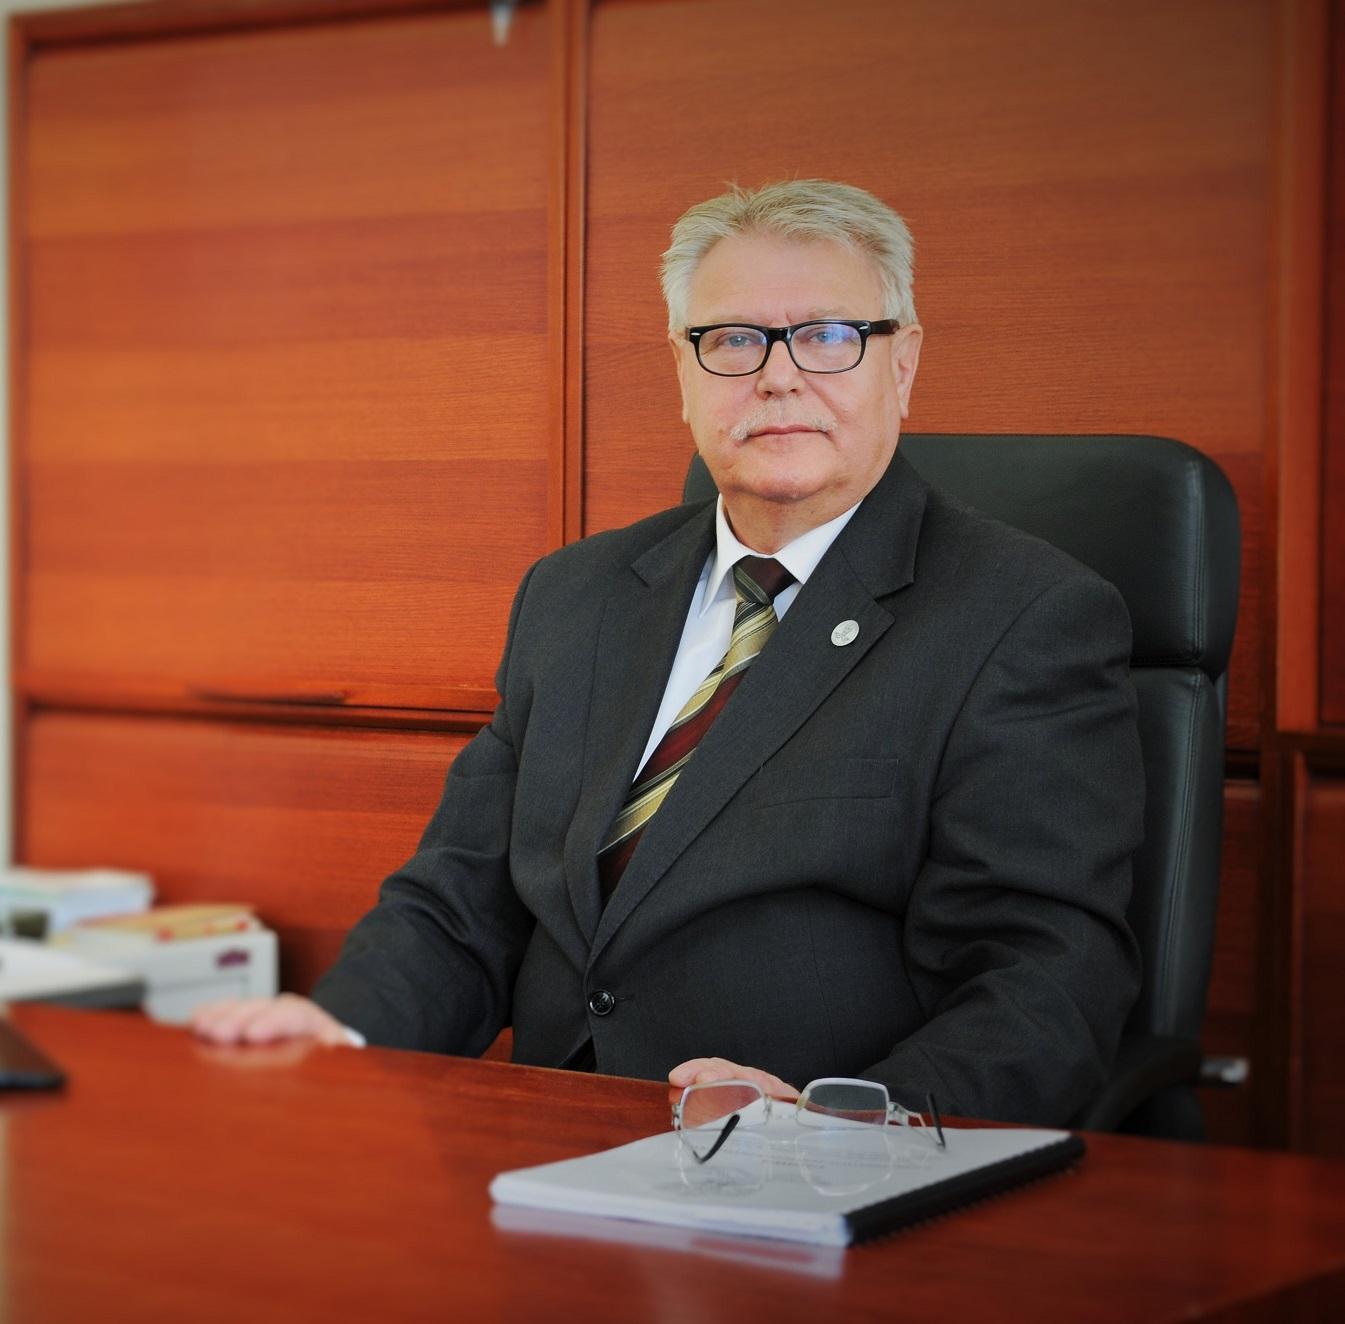 Dyrektor Józef Kiełbasa